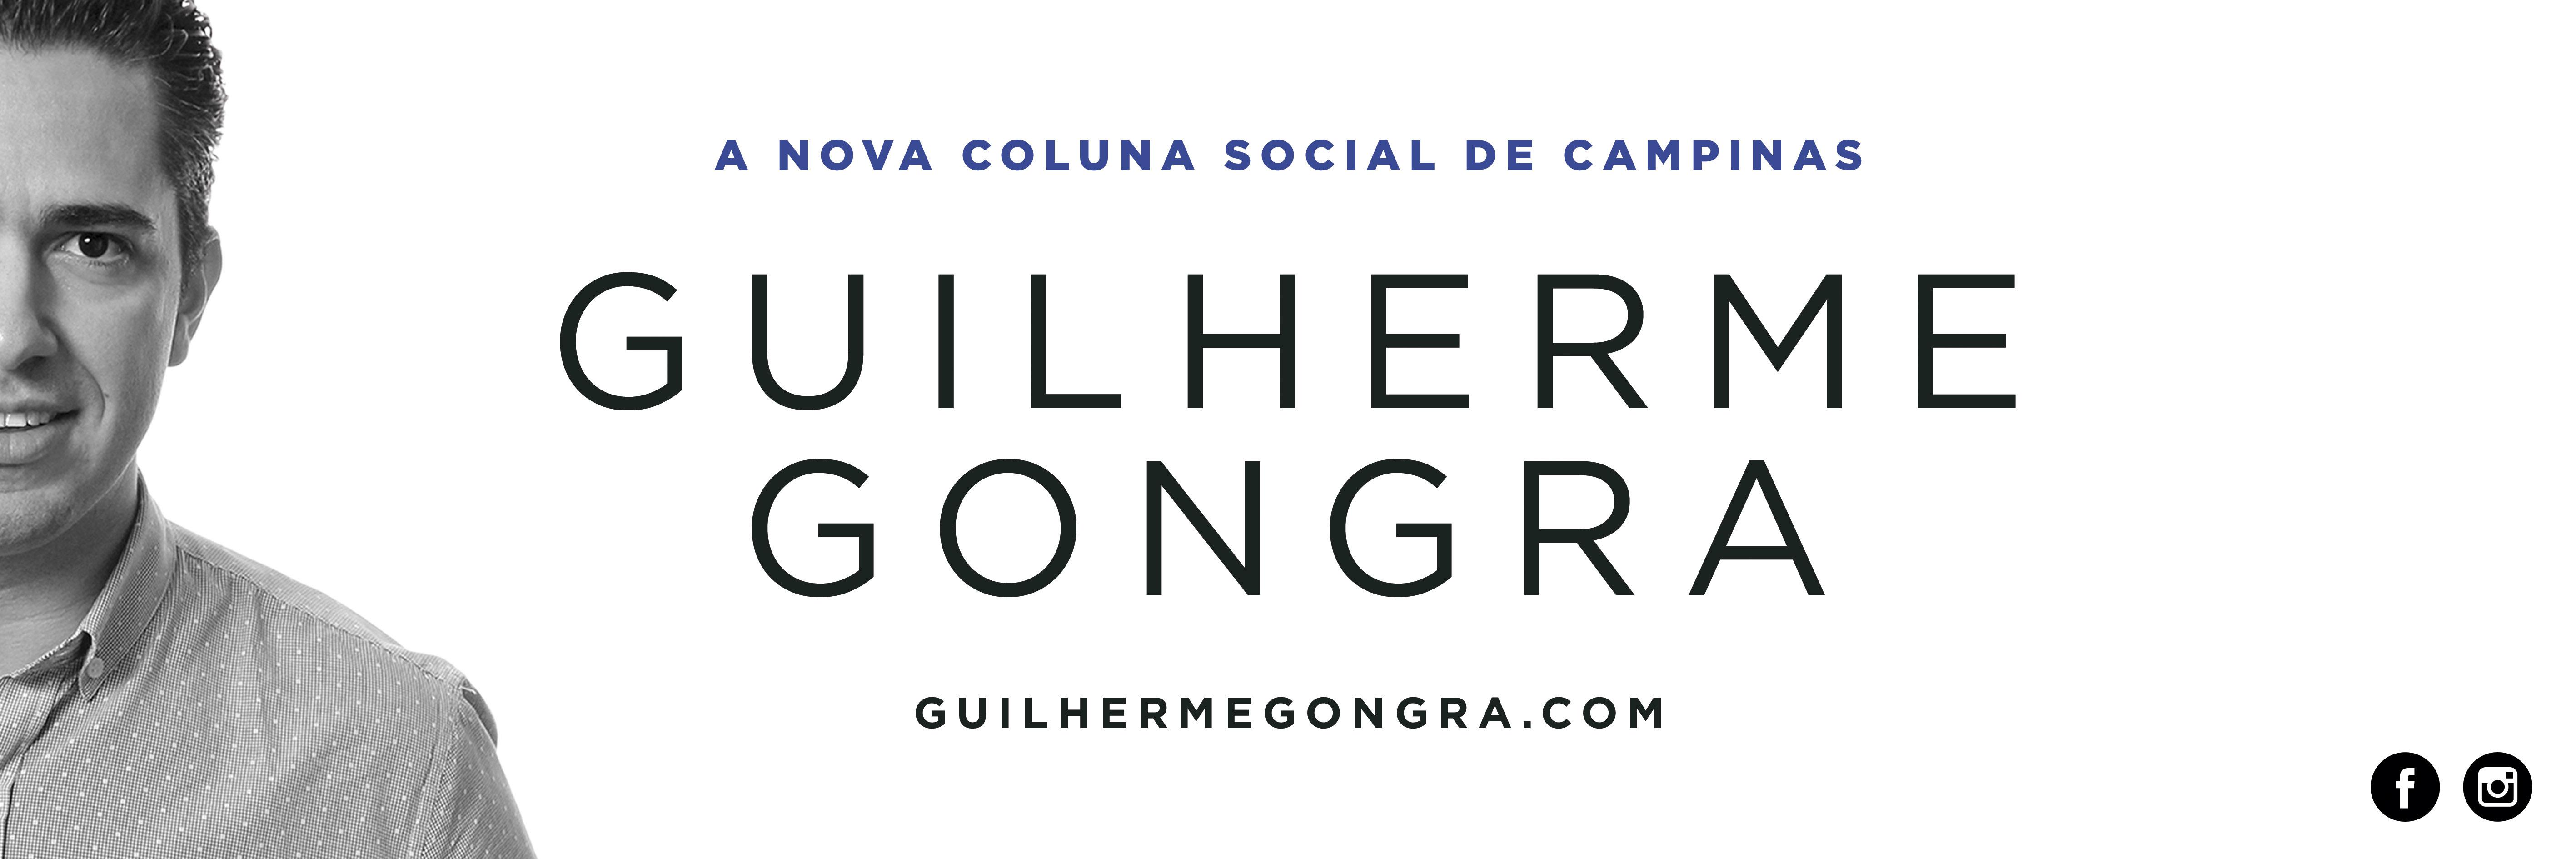 Contate Guilherme Gongra